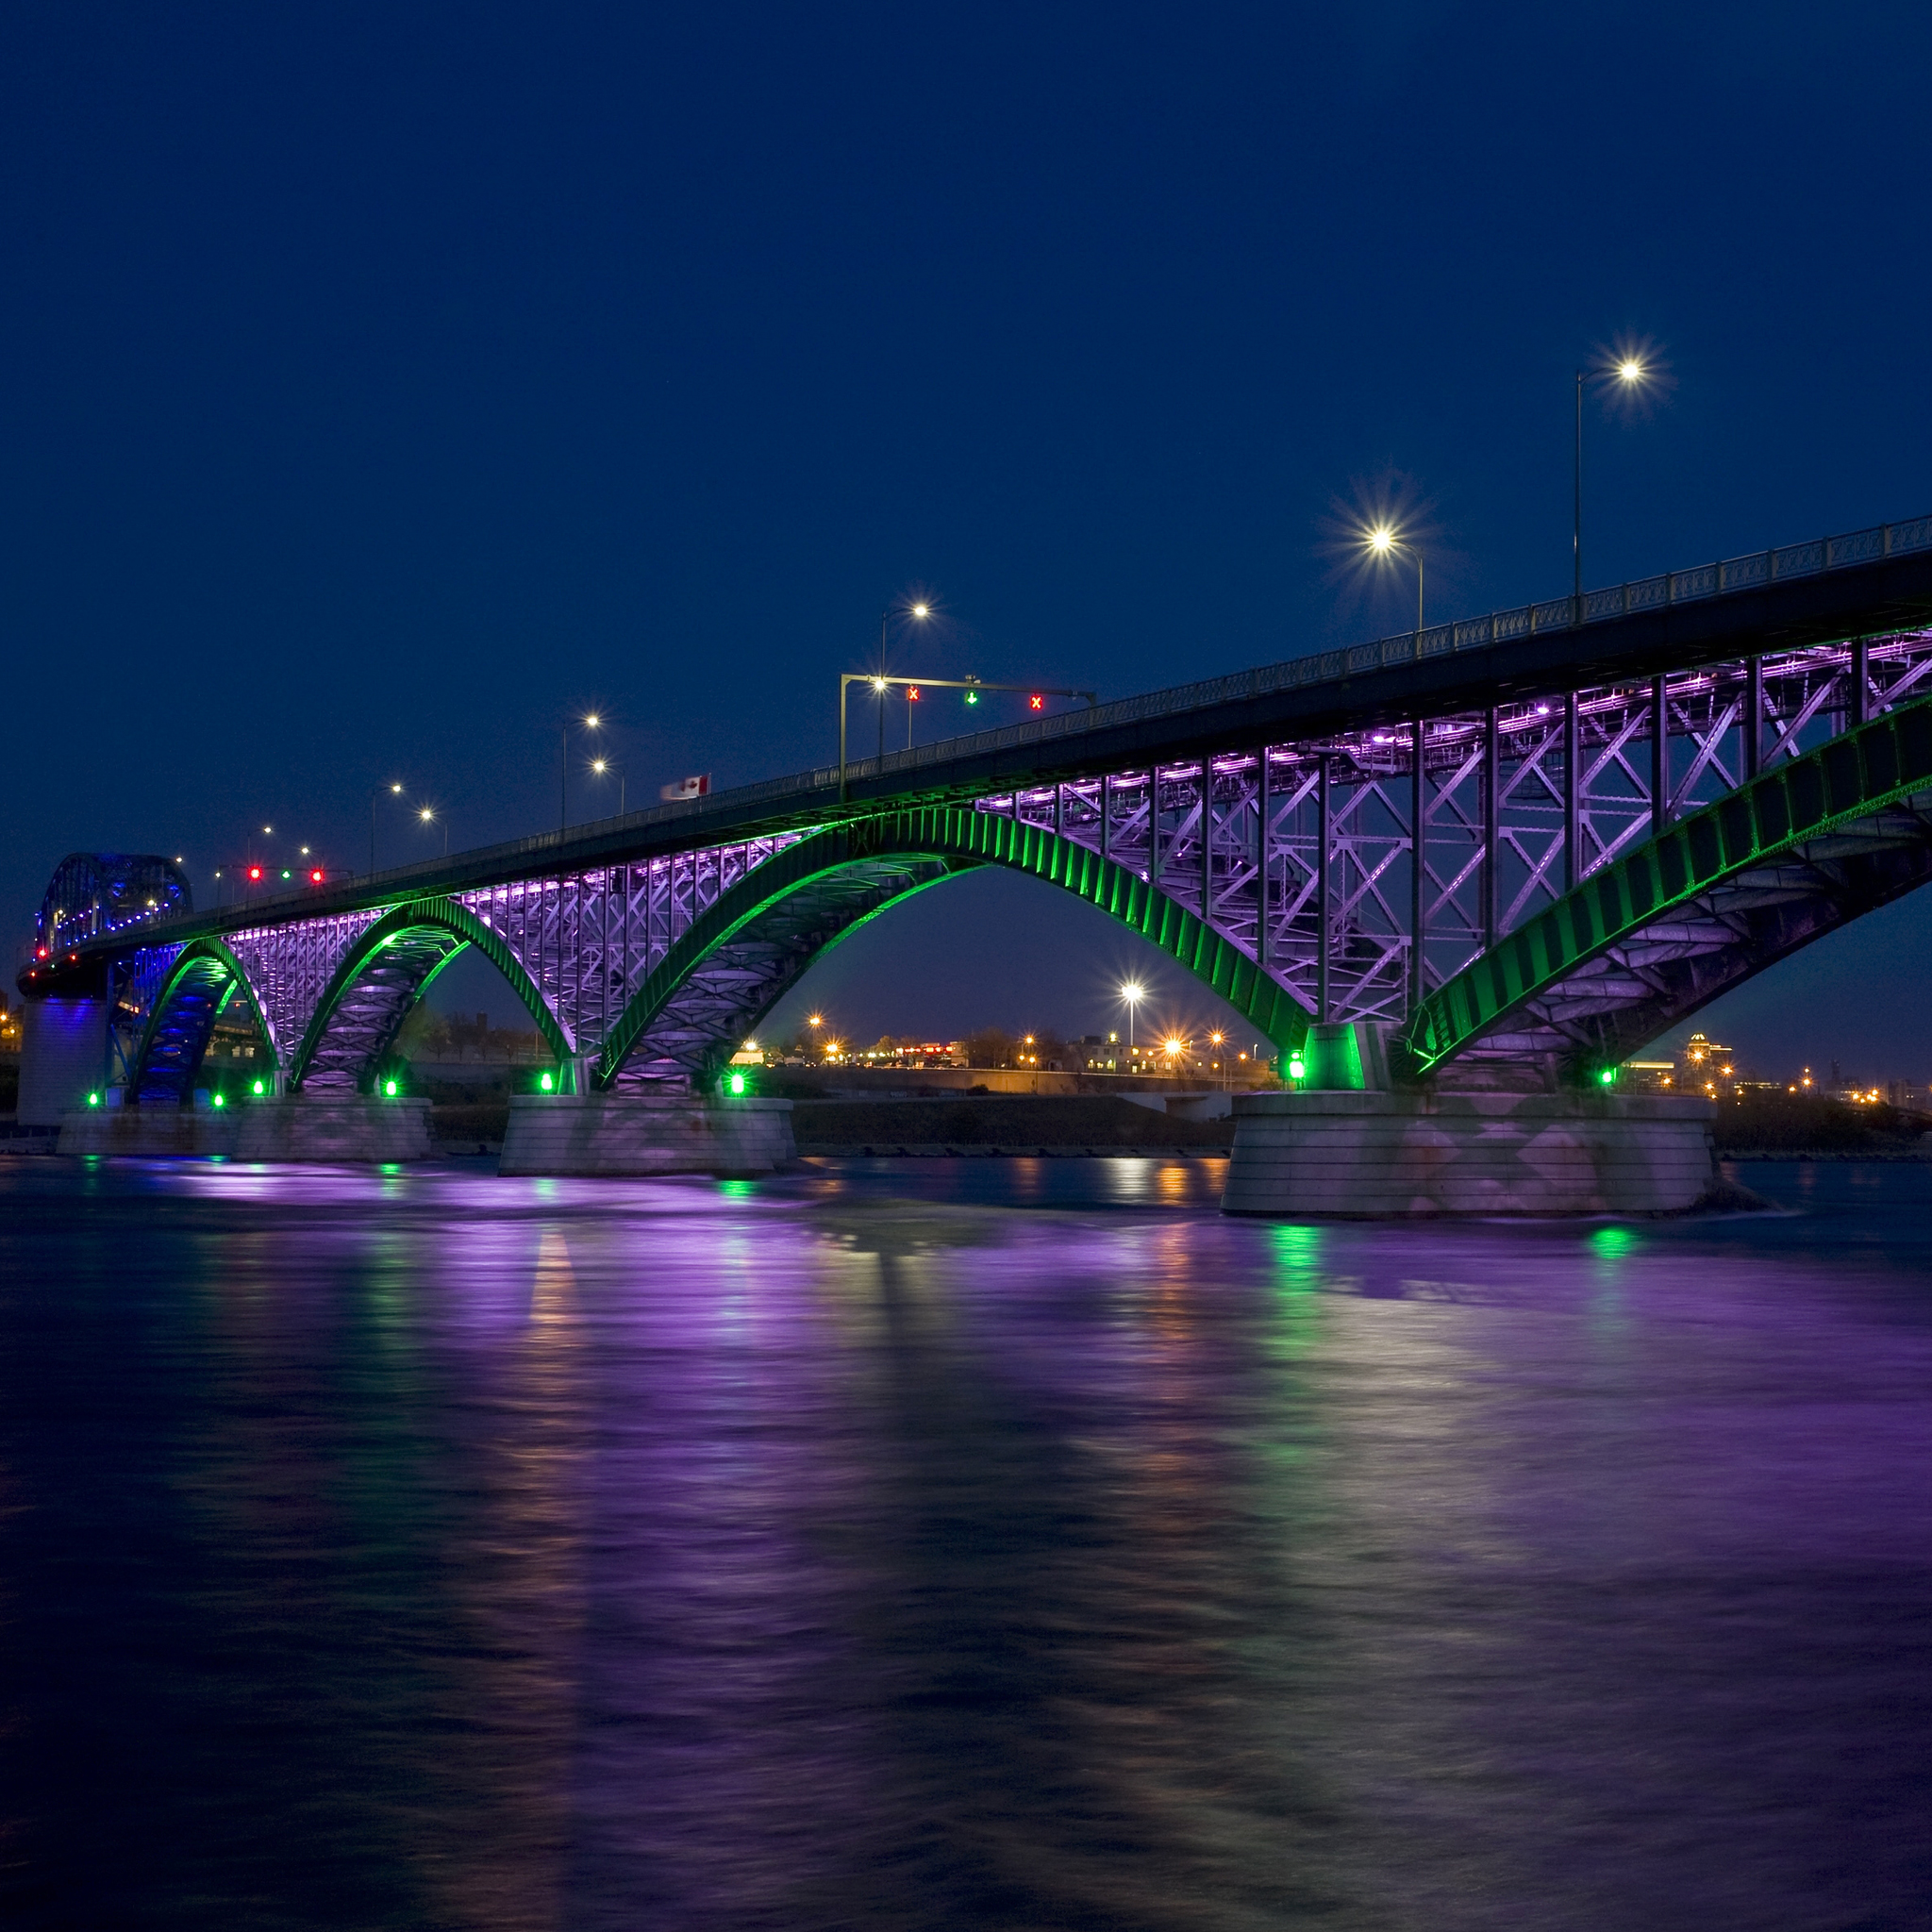 Peace-Bridge-by-Night-3Wallpapers-iPad-Retina